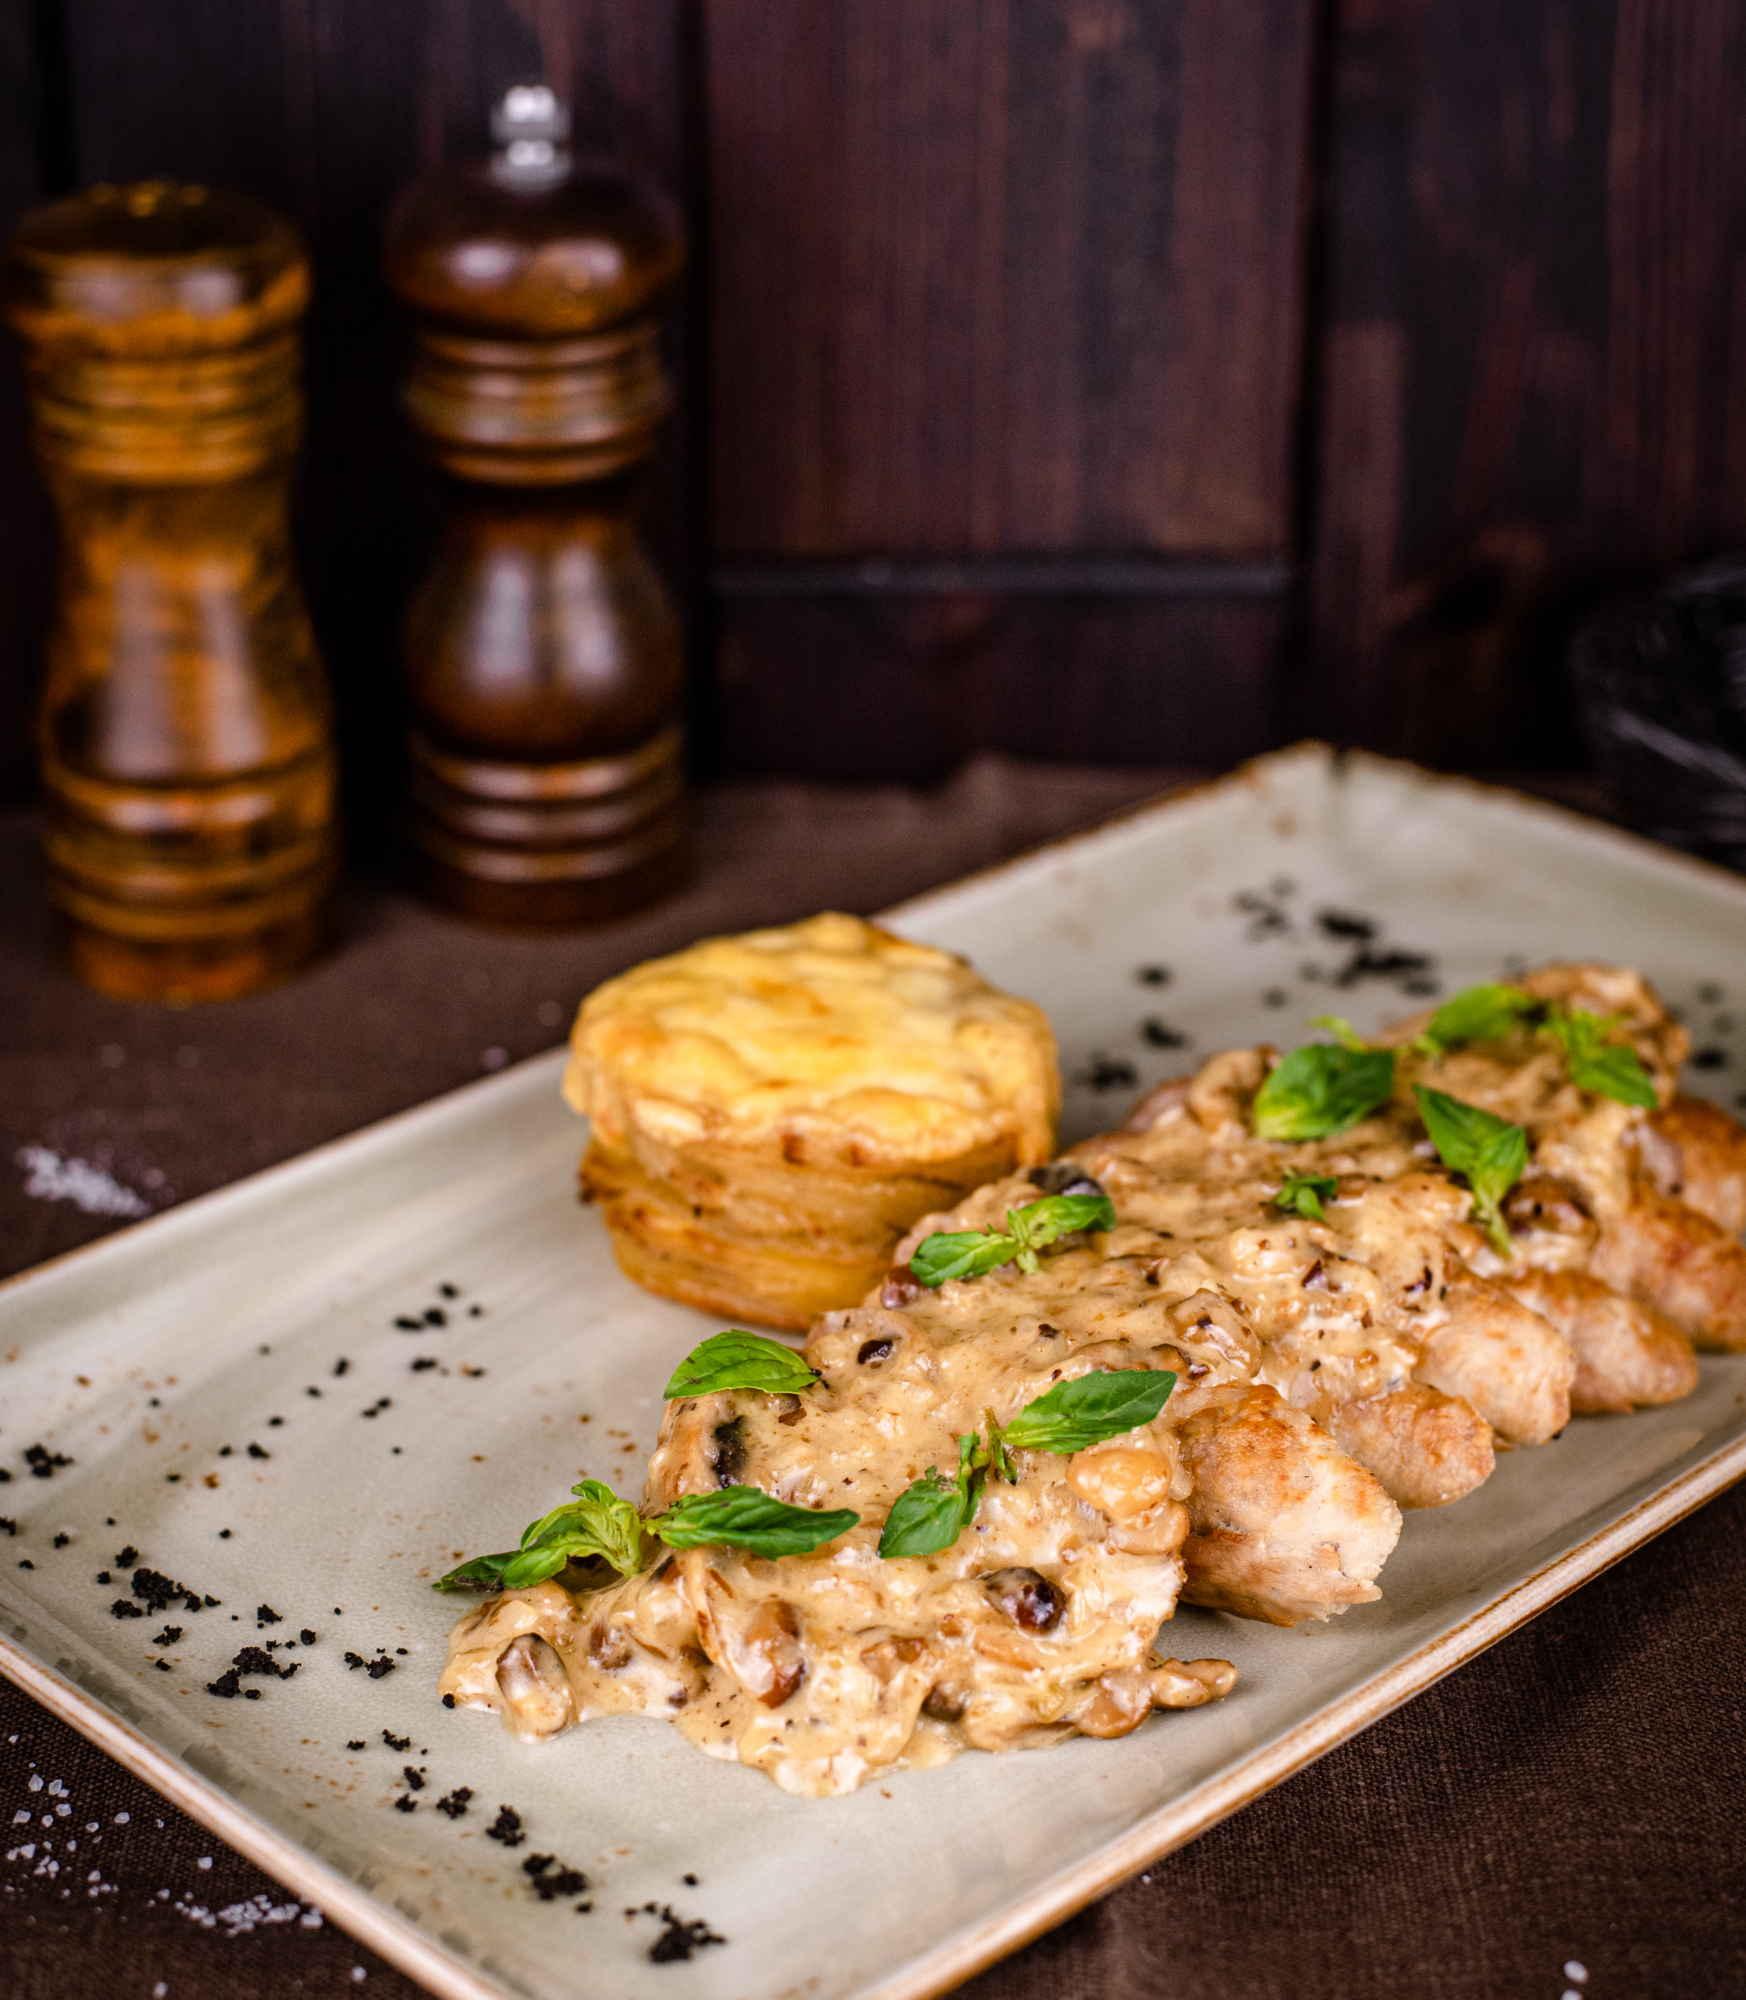 Свинина с черносливом в сливочном соусе бейлиз доставка ресторан лабиринт